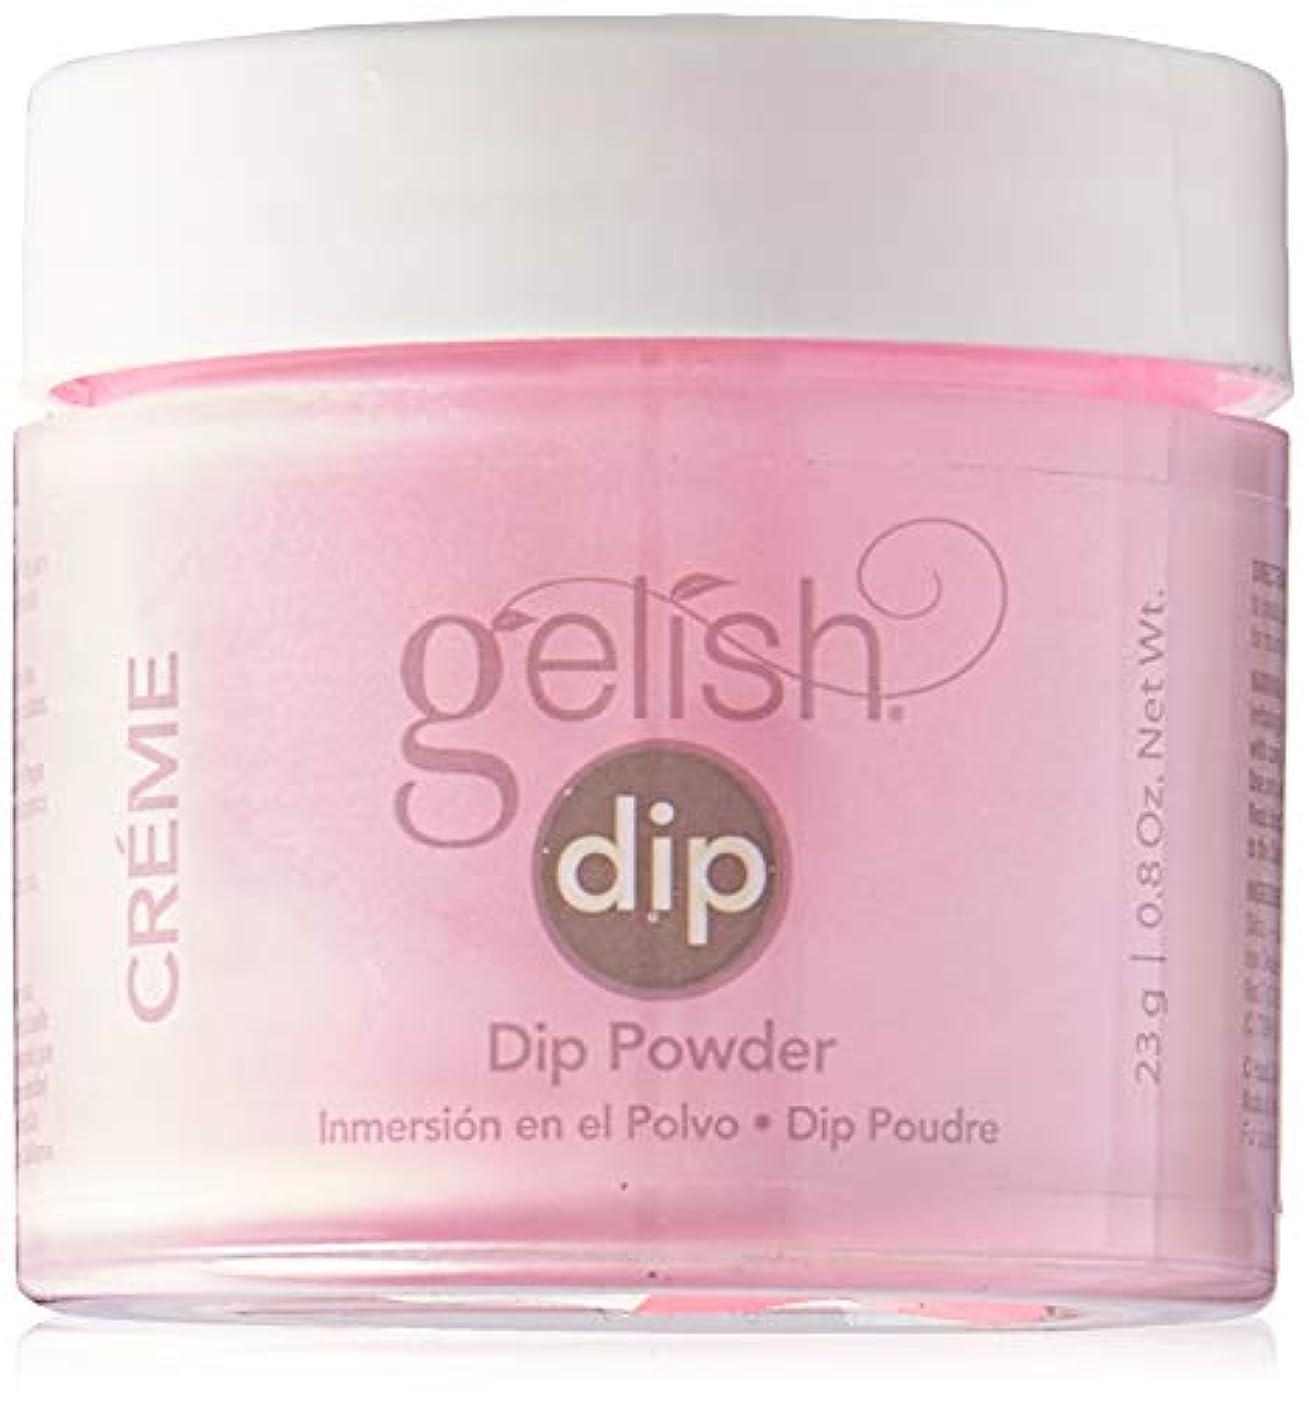 Harmony Gelish - Acrylic Dip Powder - Look At You, Pink-achu! - 23g / 0.8oz